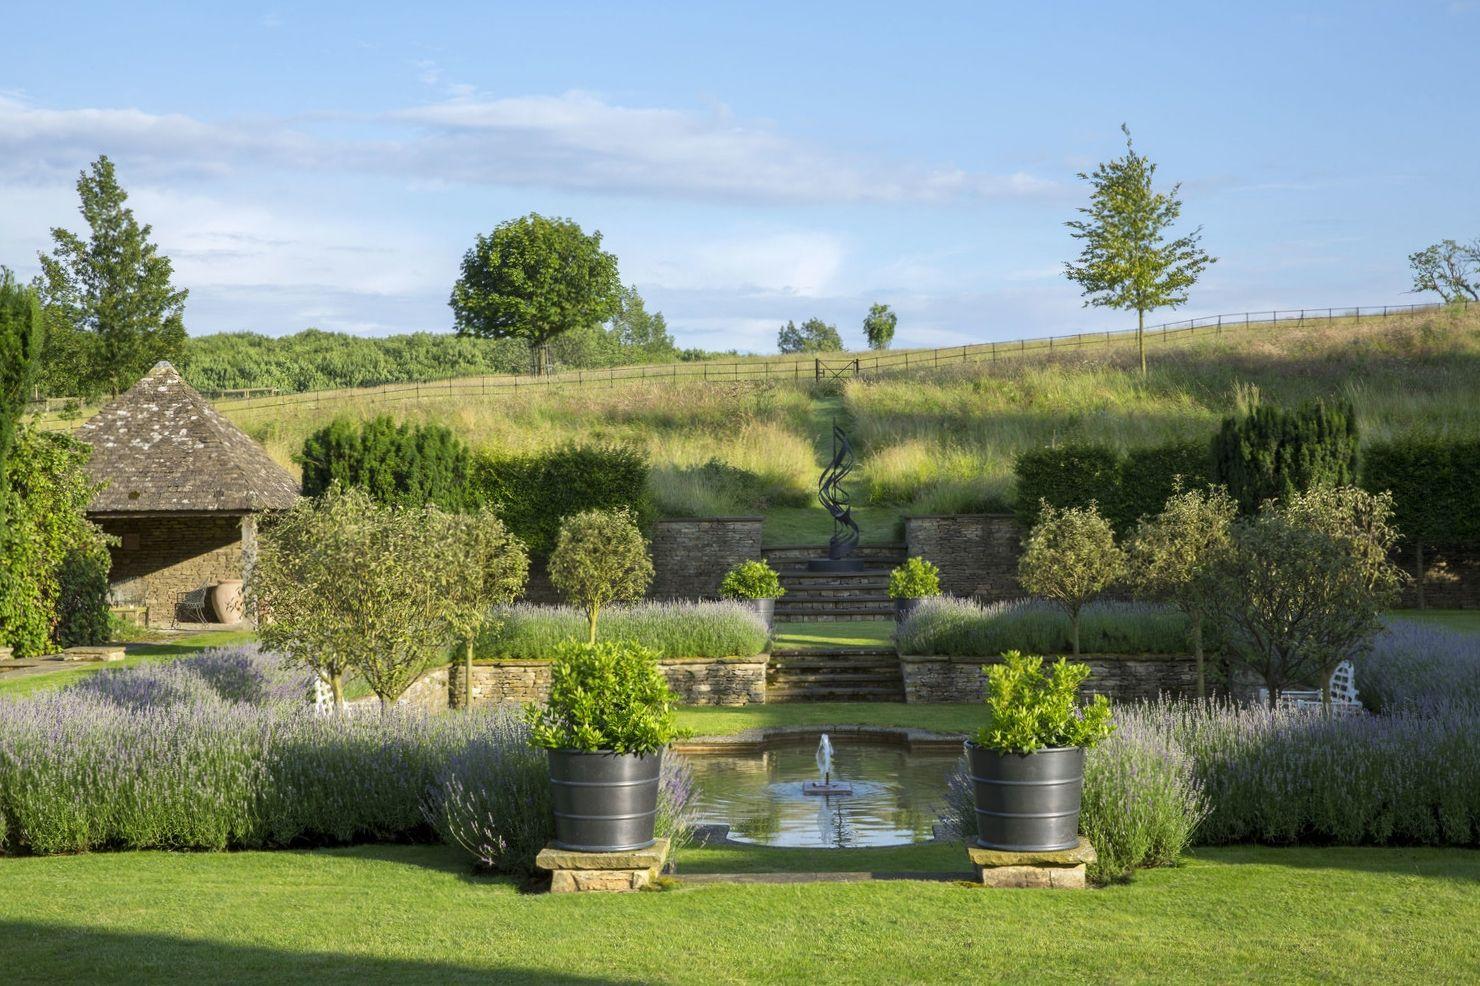 graham lloydbrunt garden design Beautiful Landscapes